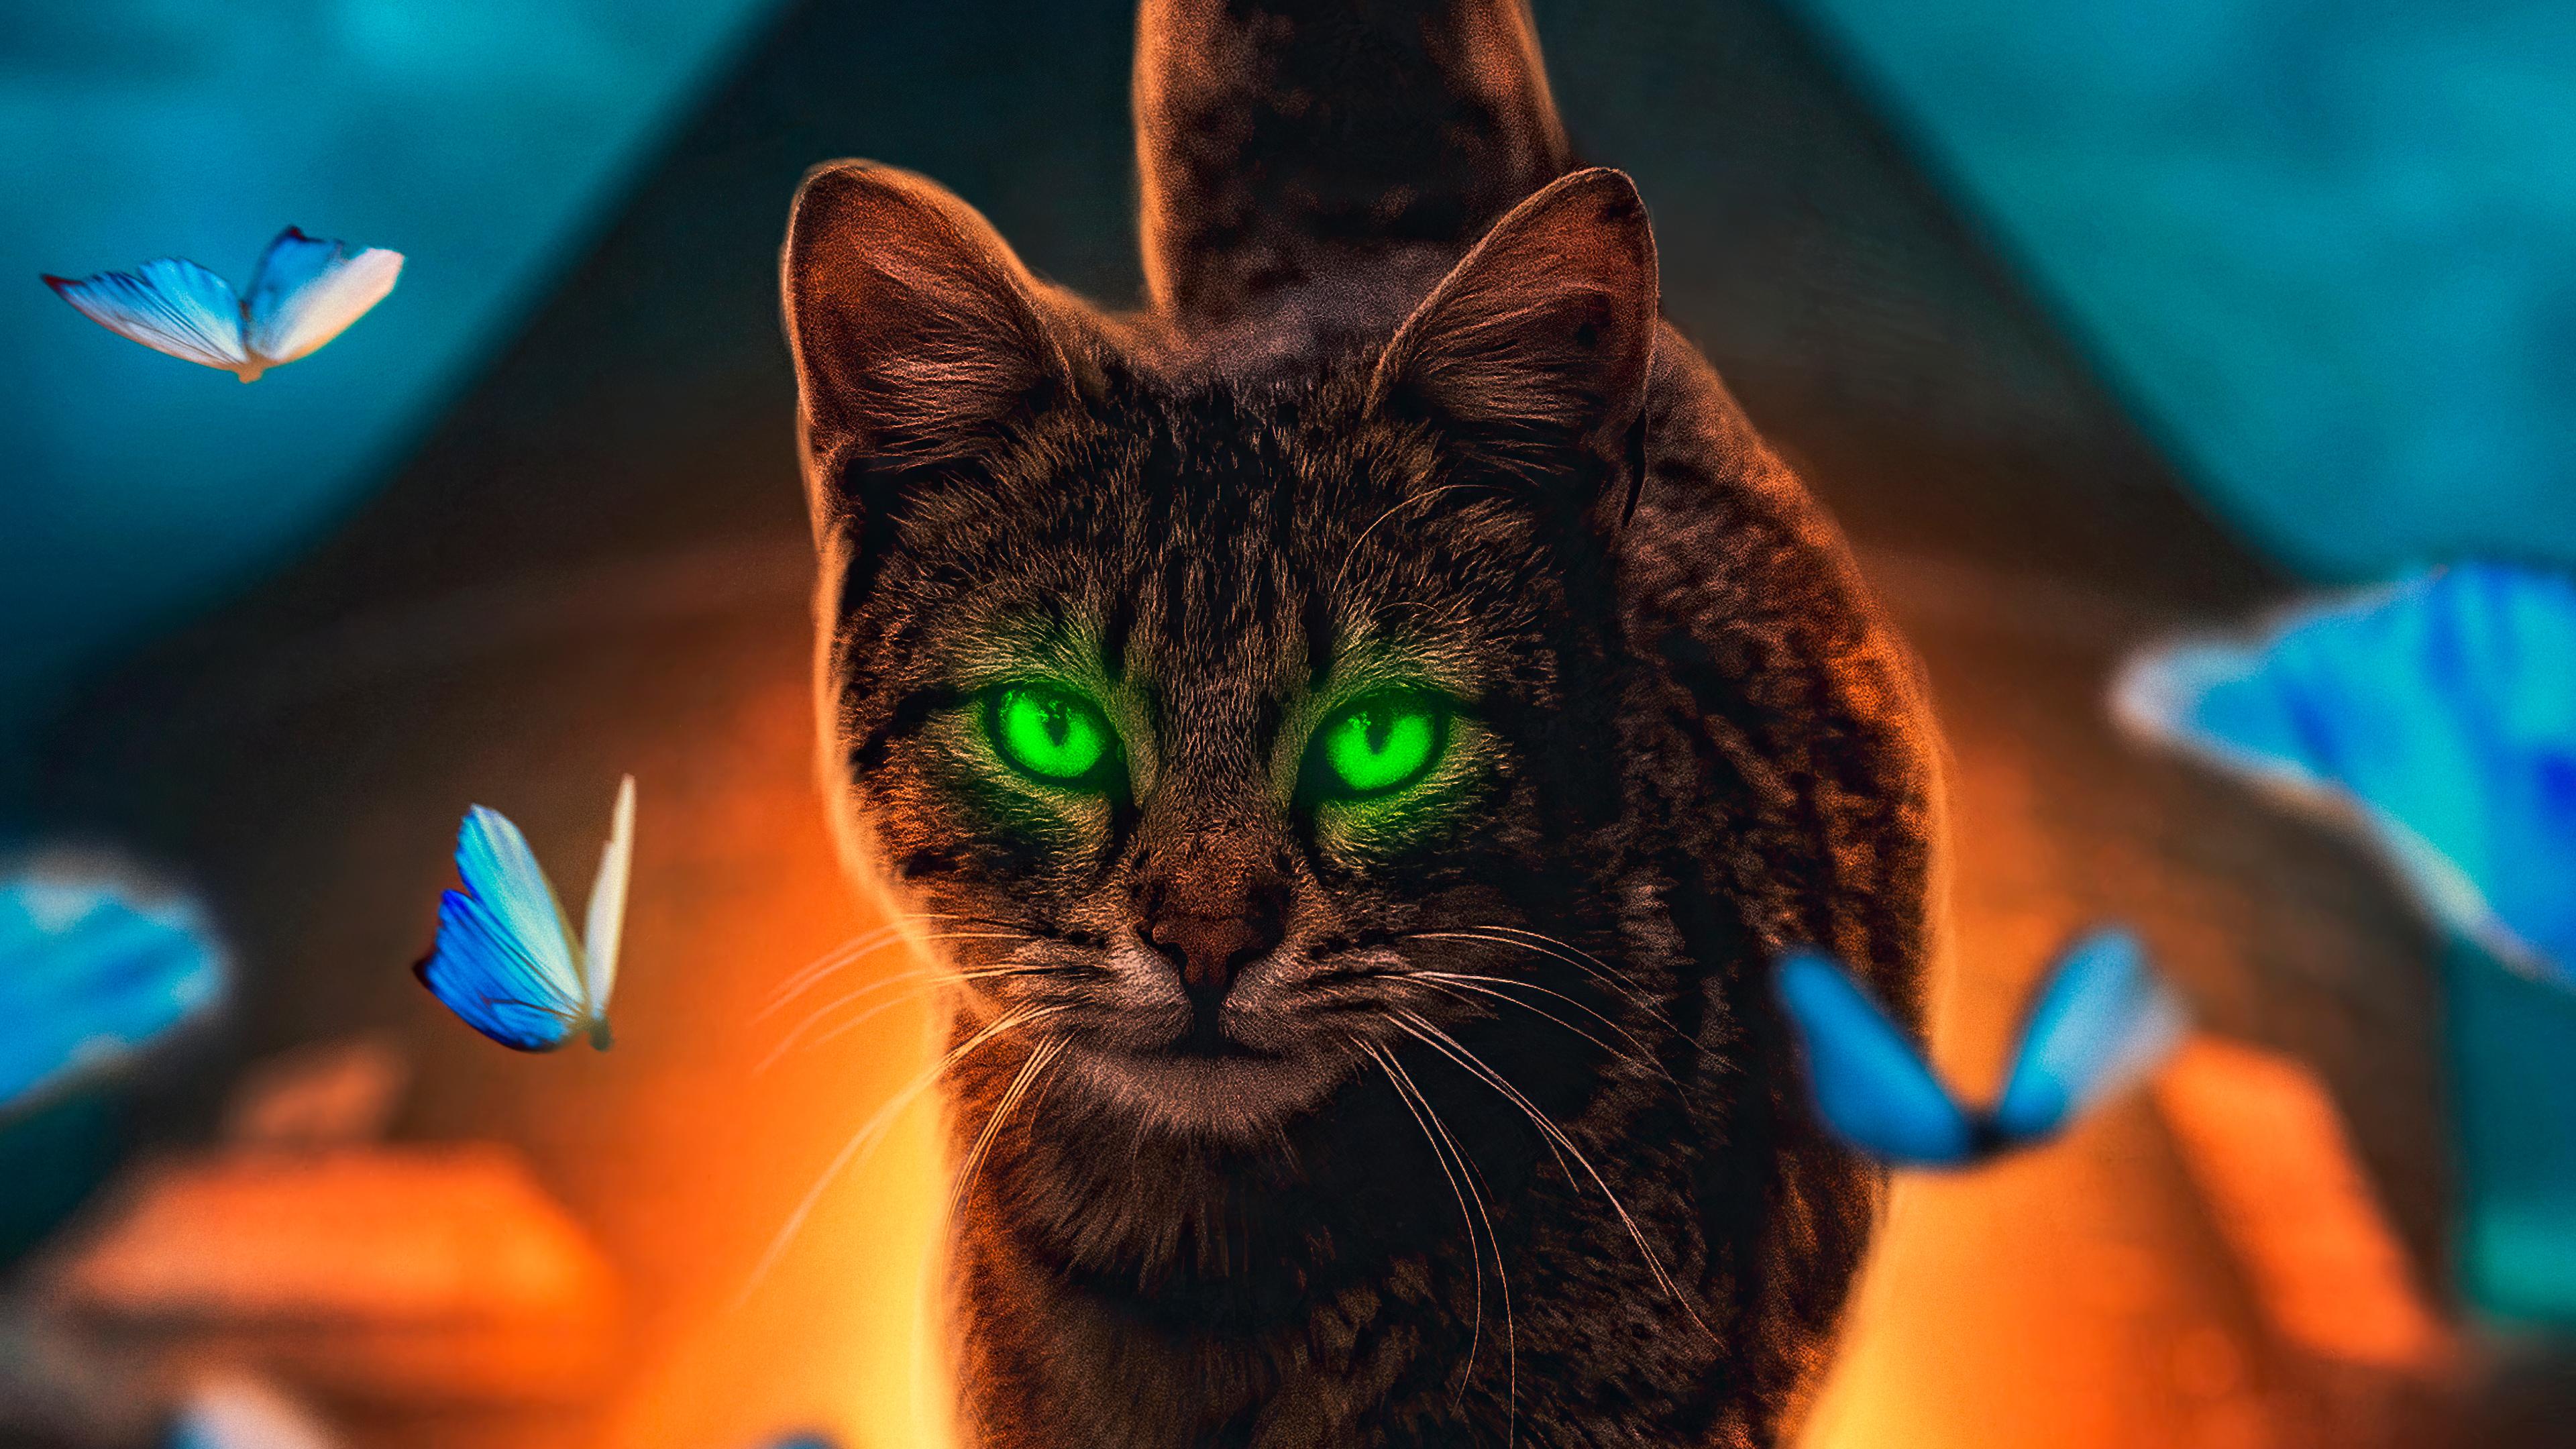 cat magical walk 4k 1602359217 - Cat Magical Walk 4k - Cat Magical Walk 4k wallpapers